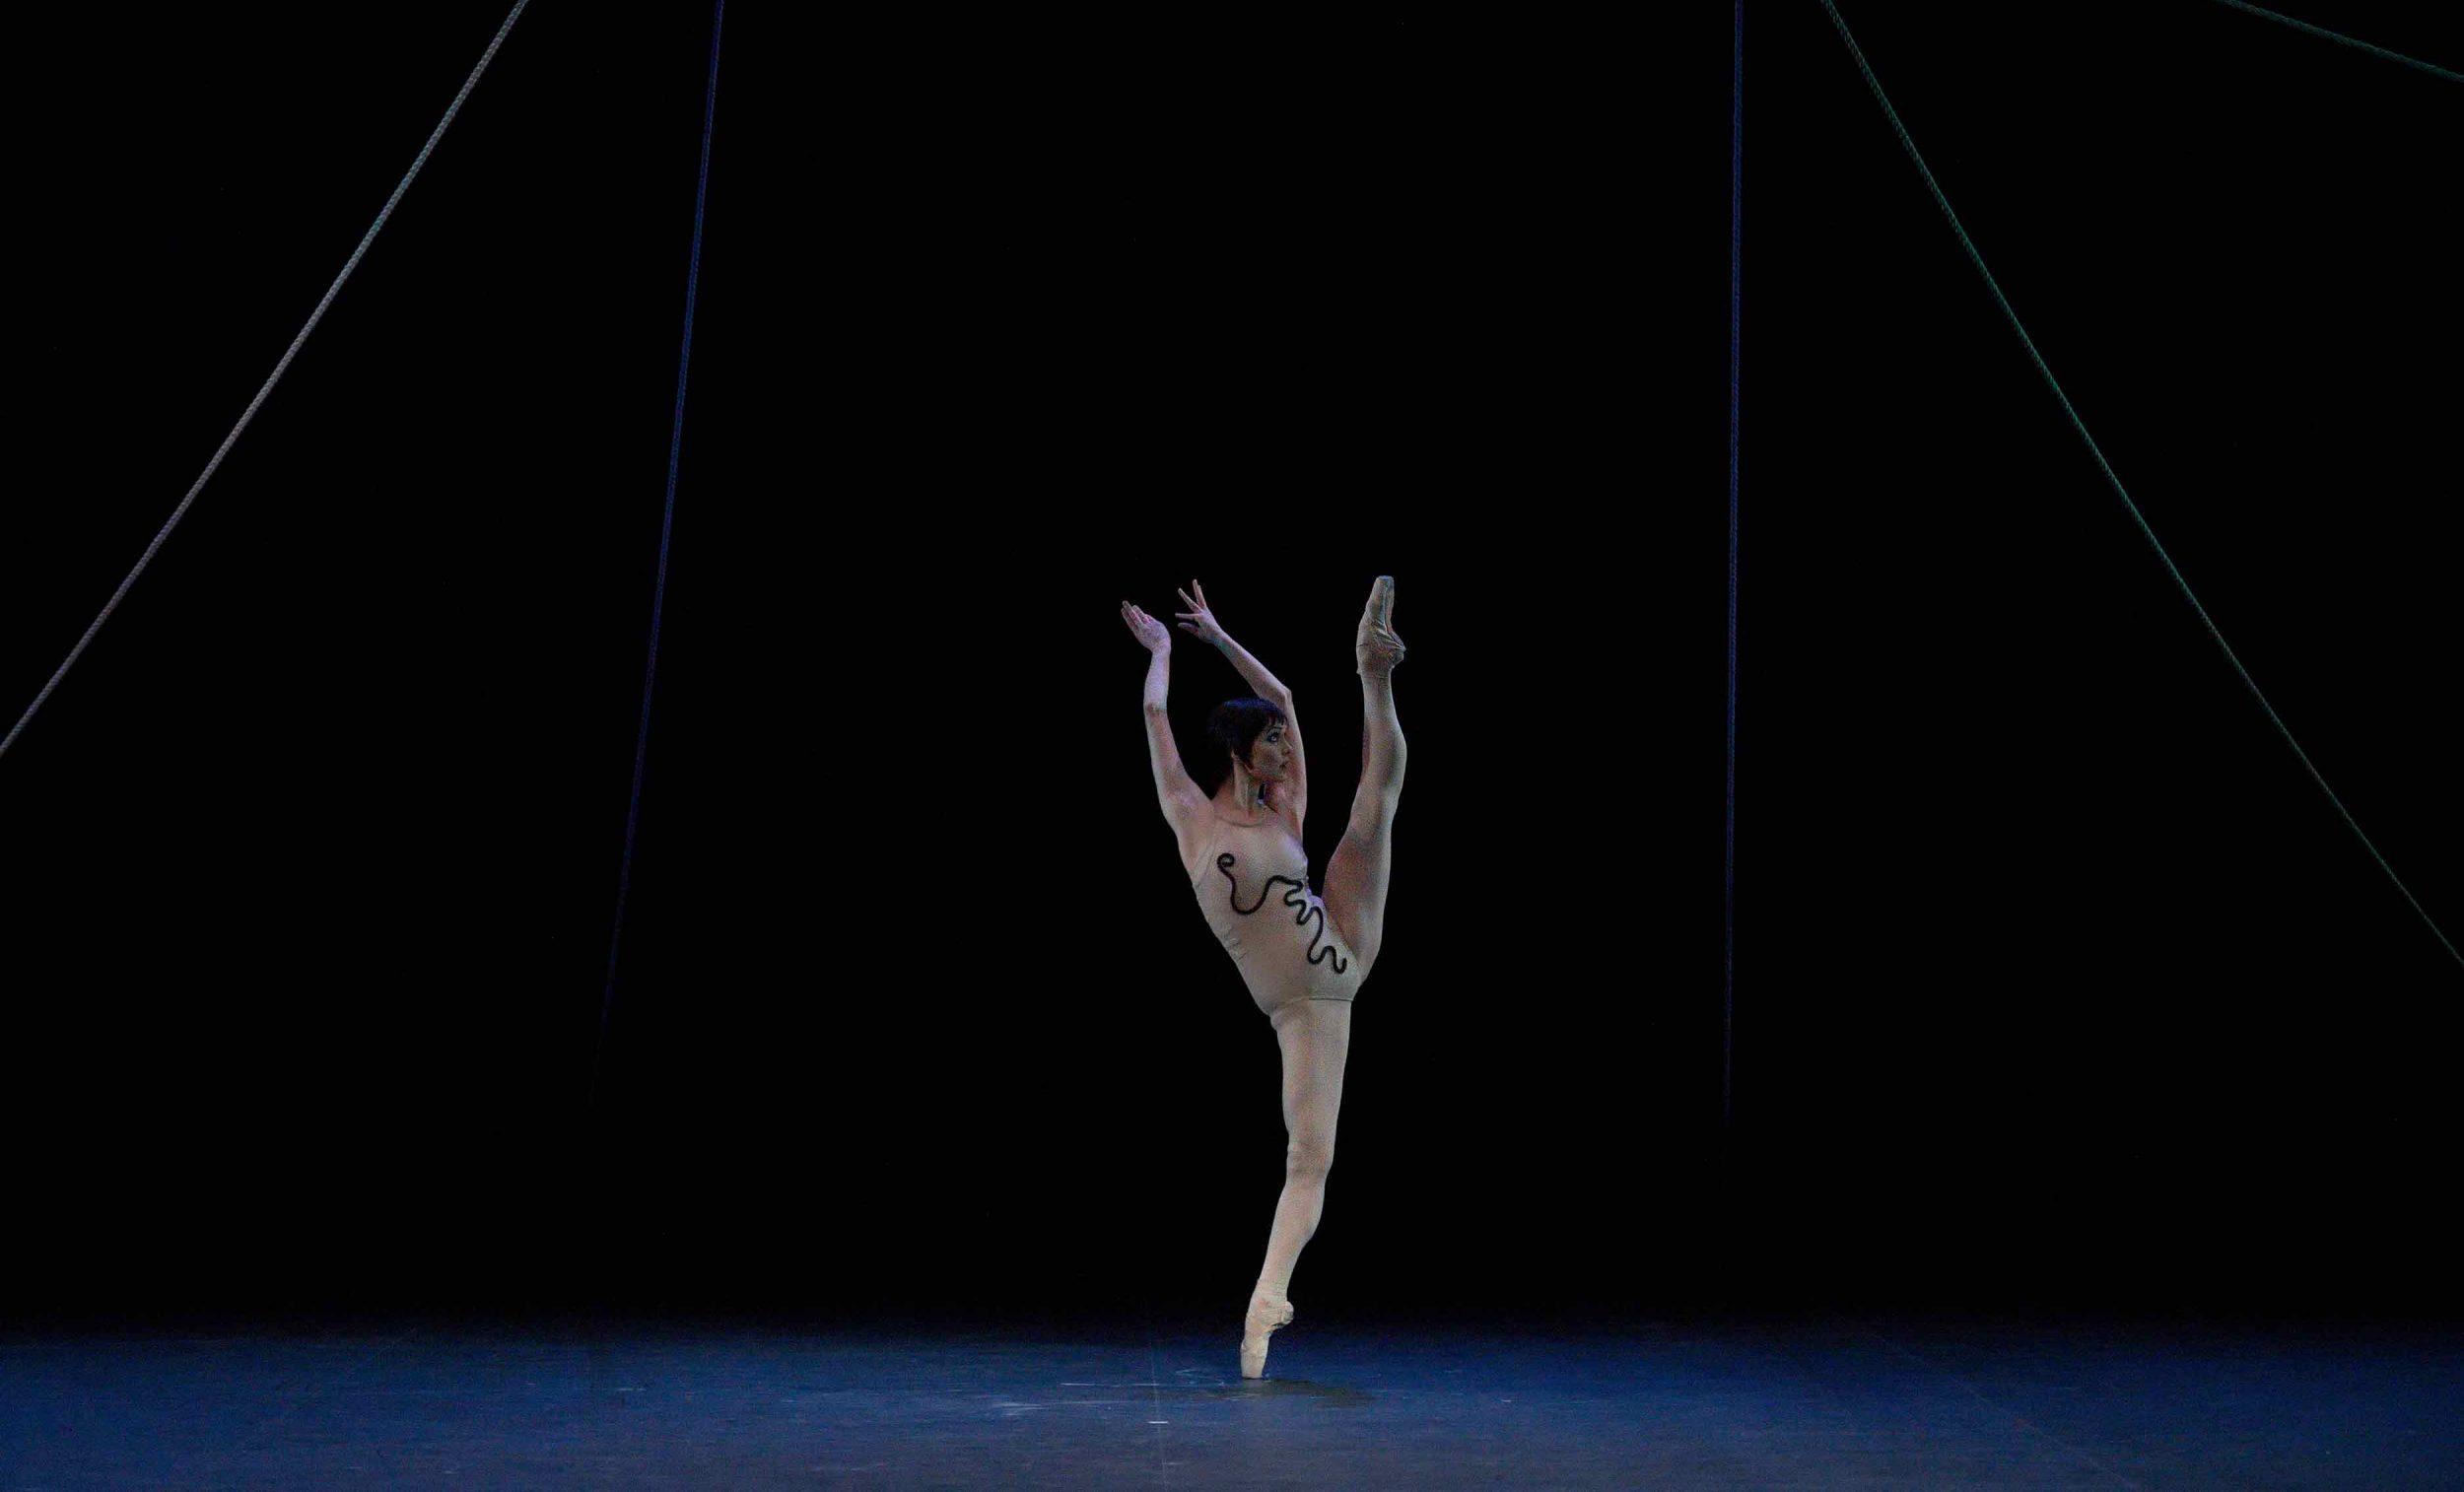 Jurgita-Dronina-in-The-Cage-by-Jerome-Robbins-©-Laurent-Liotardo